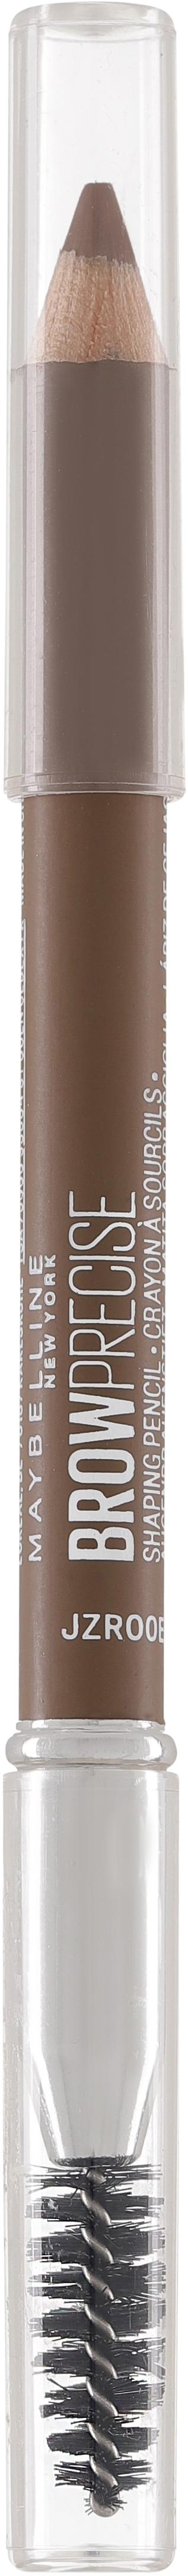 https lyko com en maybelline new york maybelline new york brow precise shaping pencil dark blond